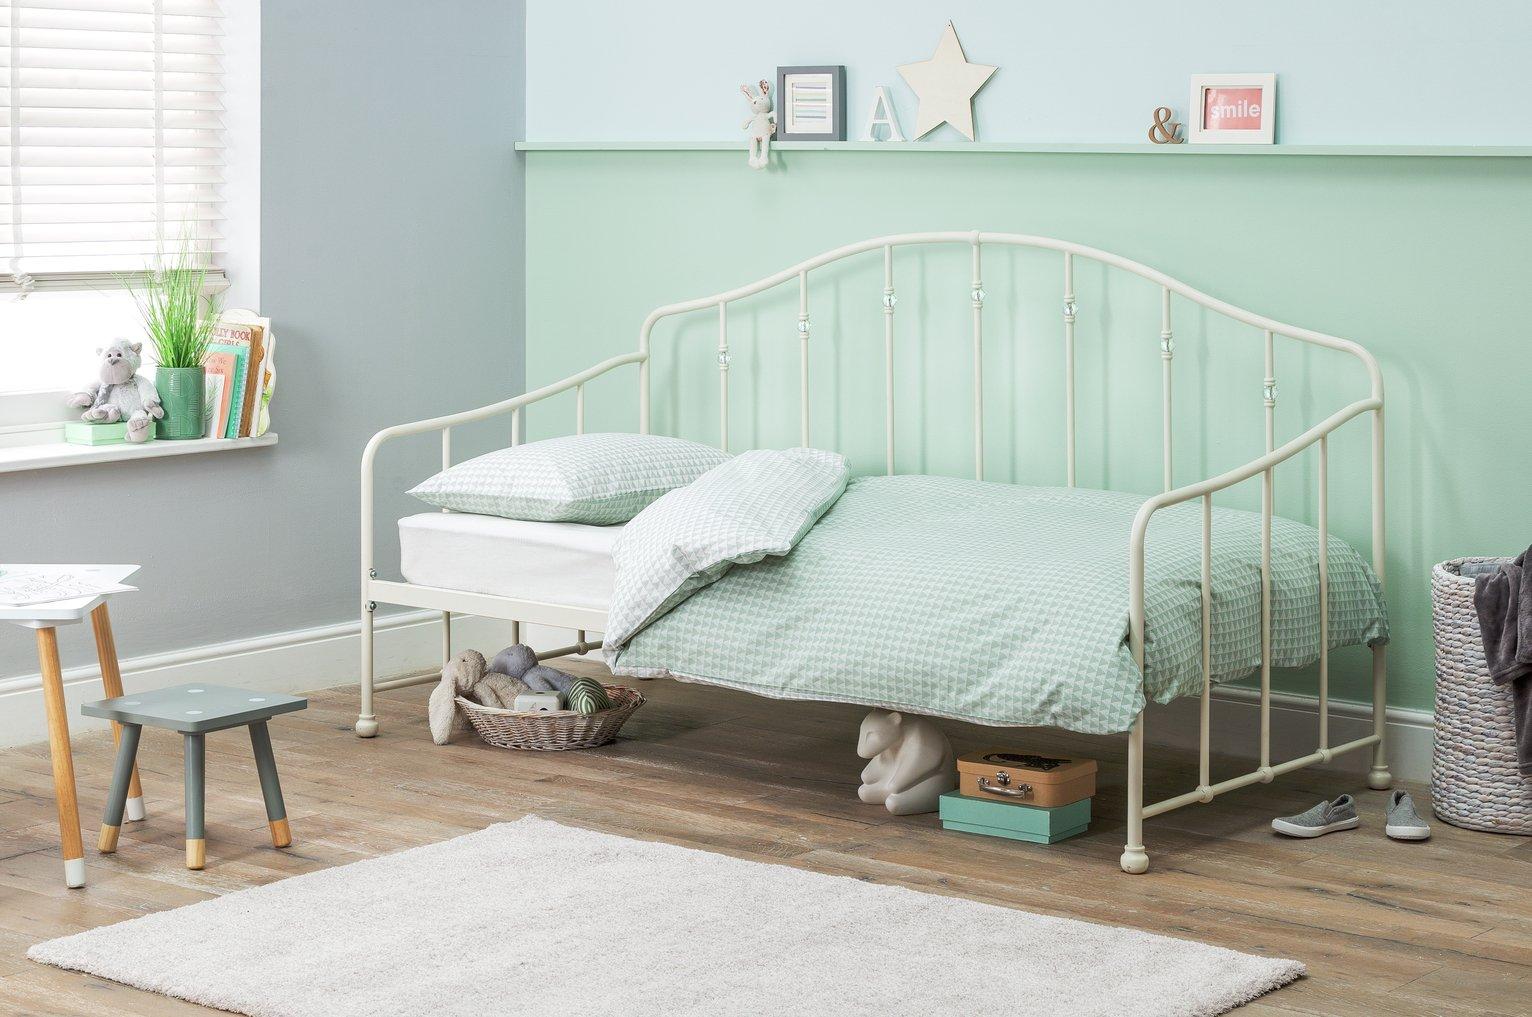 Argos Home Crystal Day Bed & Kids Mattress